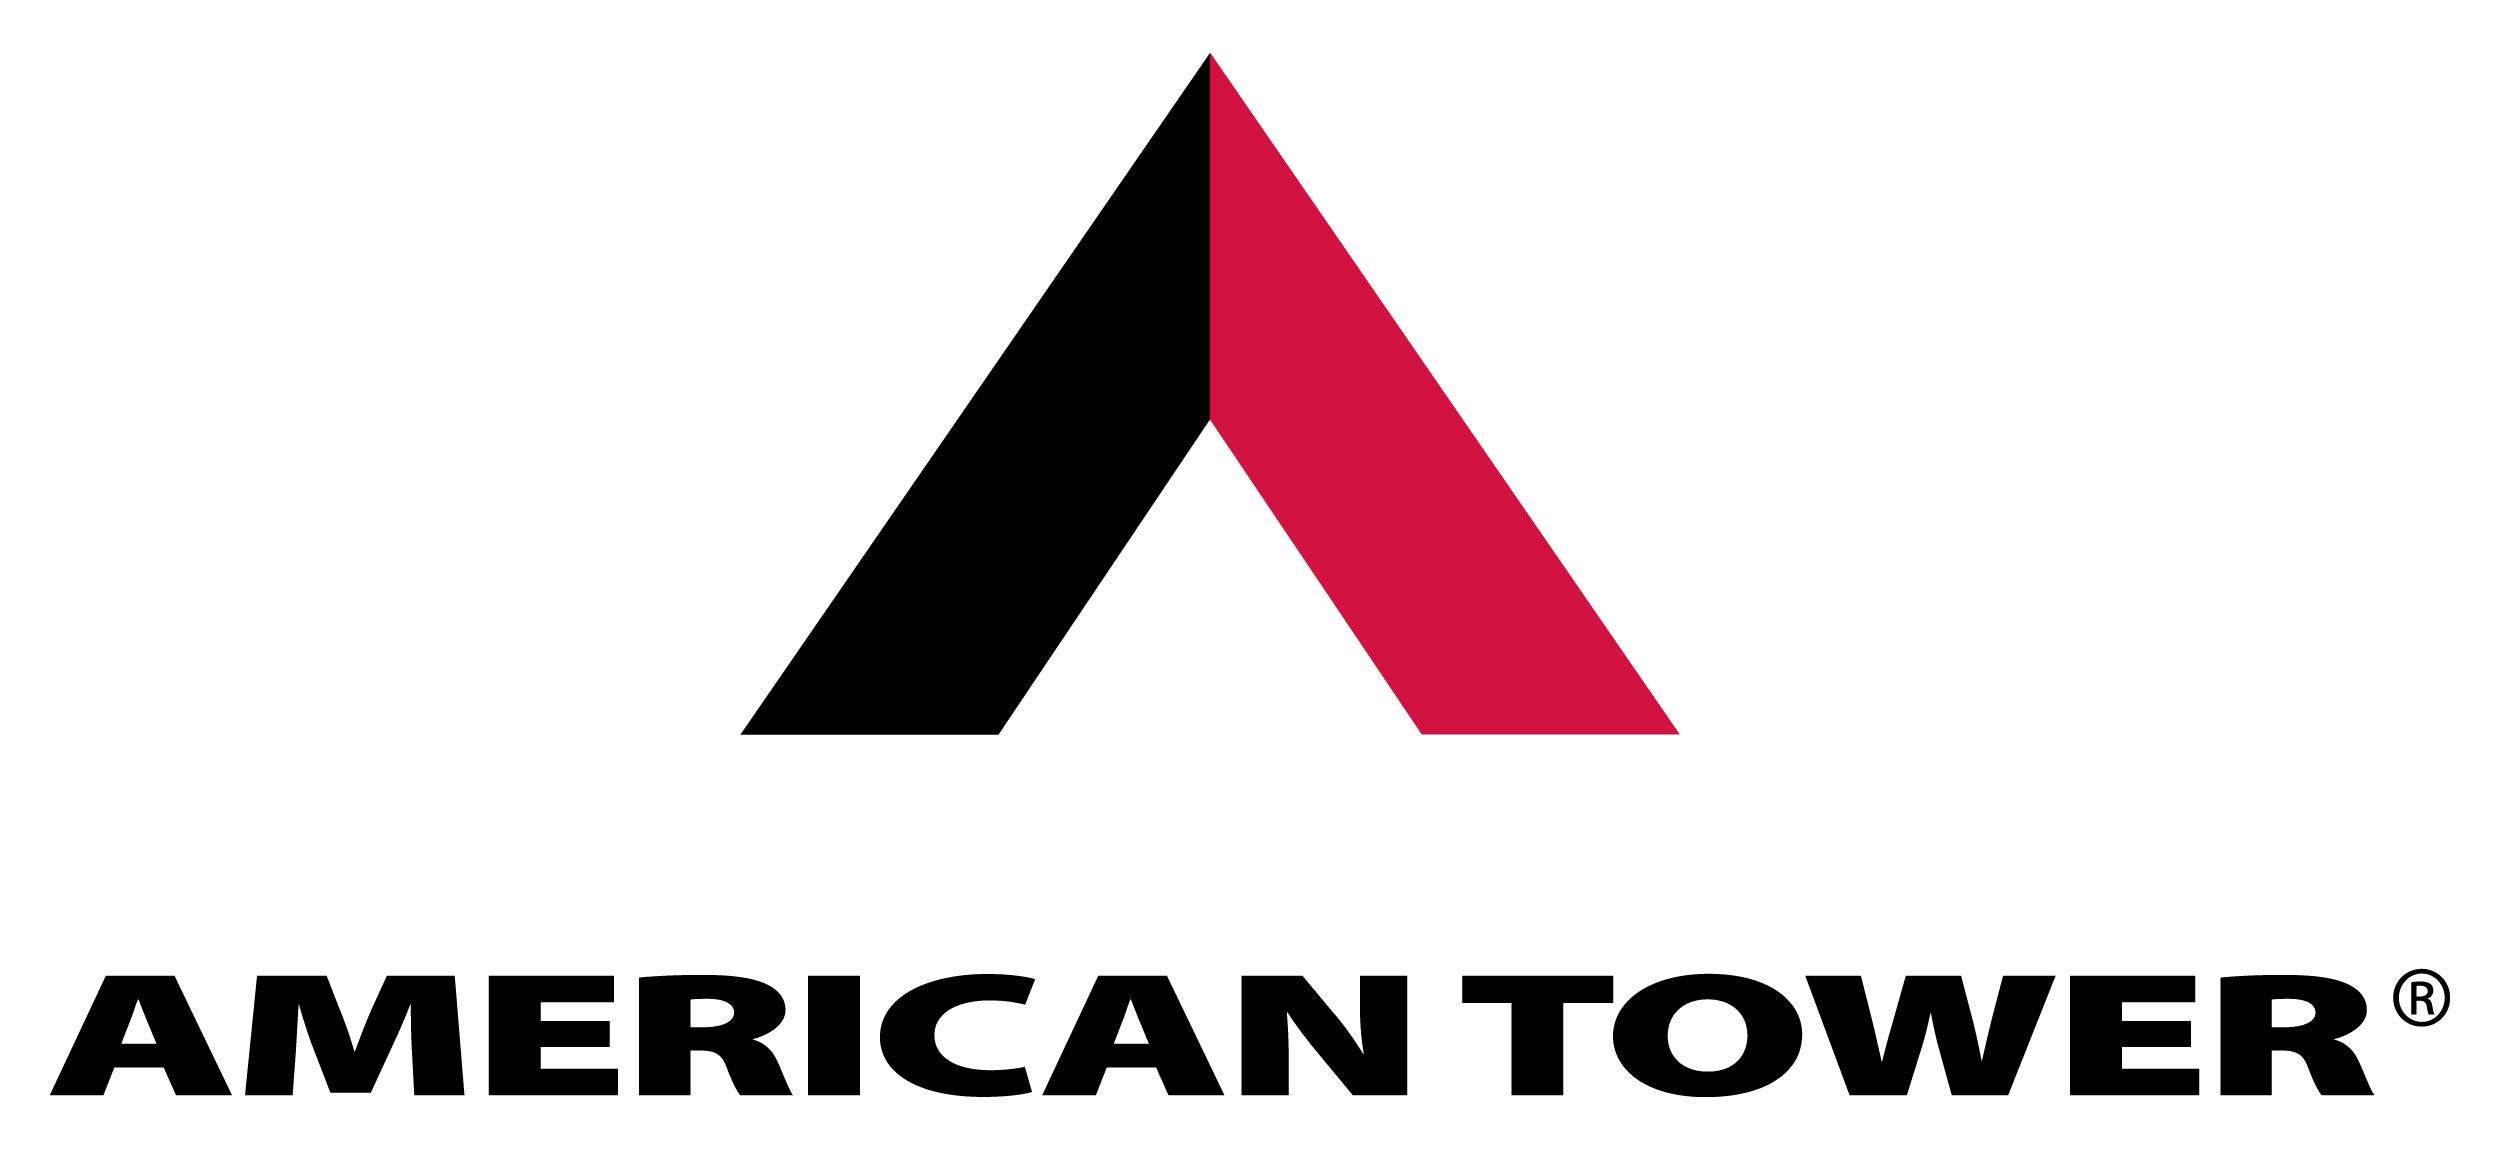 AmericanTower_logo_RGB-300dpi.jpg